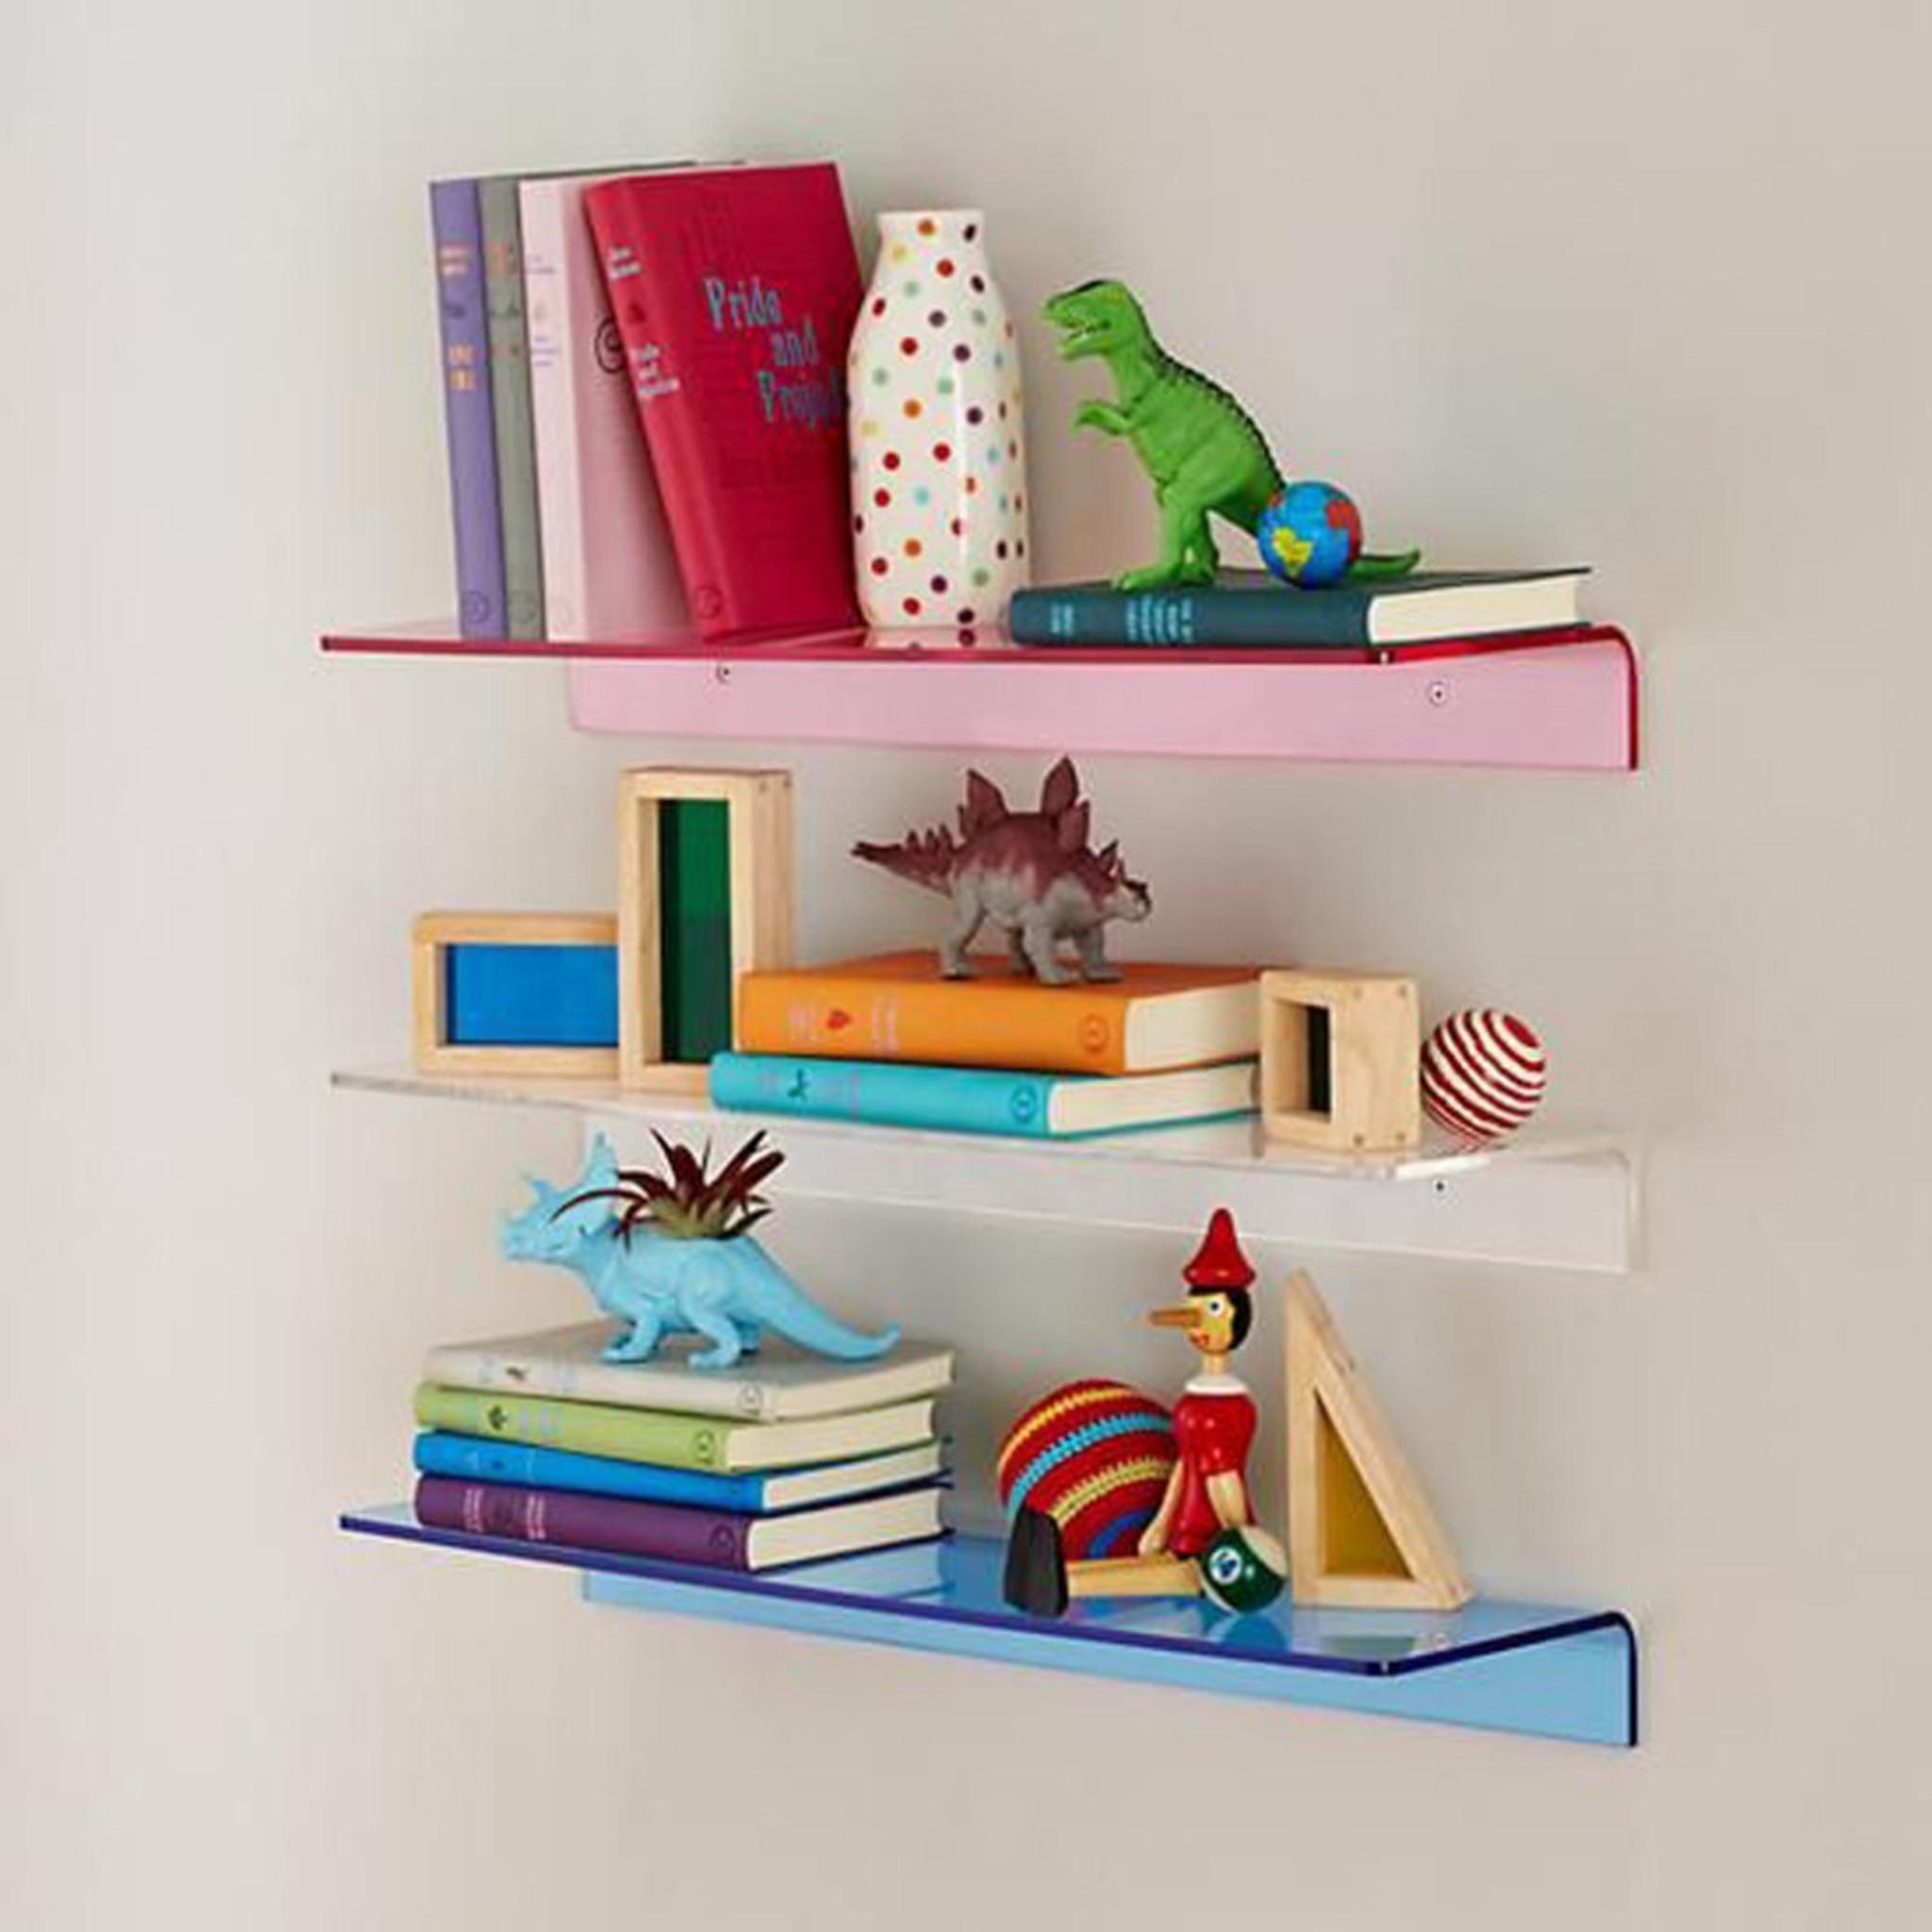 clear acrylic modern kids lucite wall shelf ledge bright neon color nursery